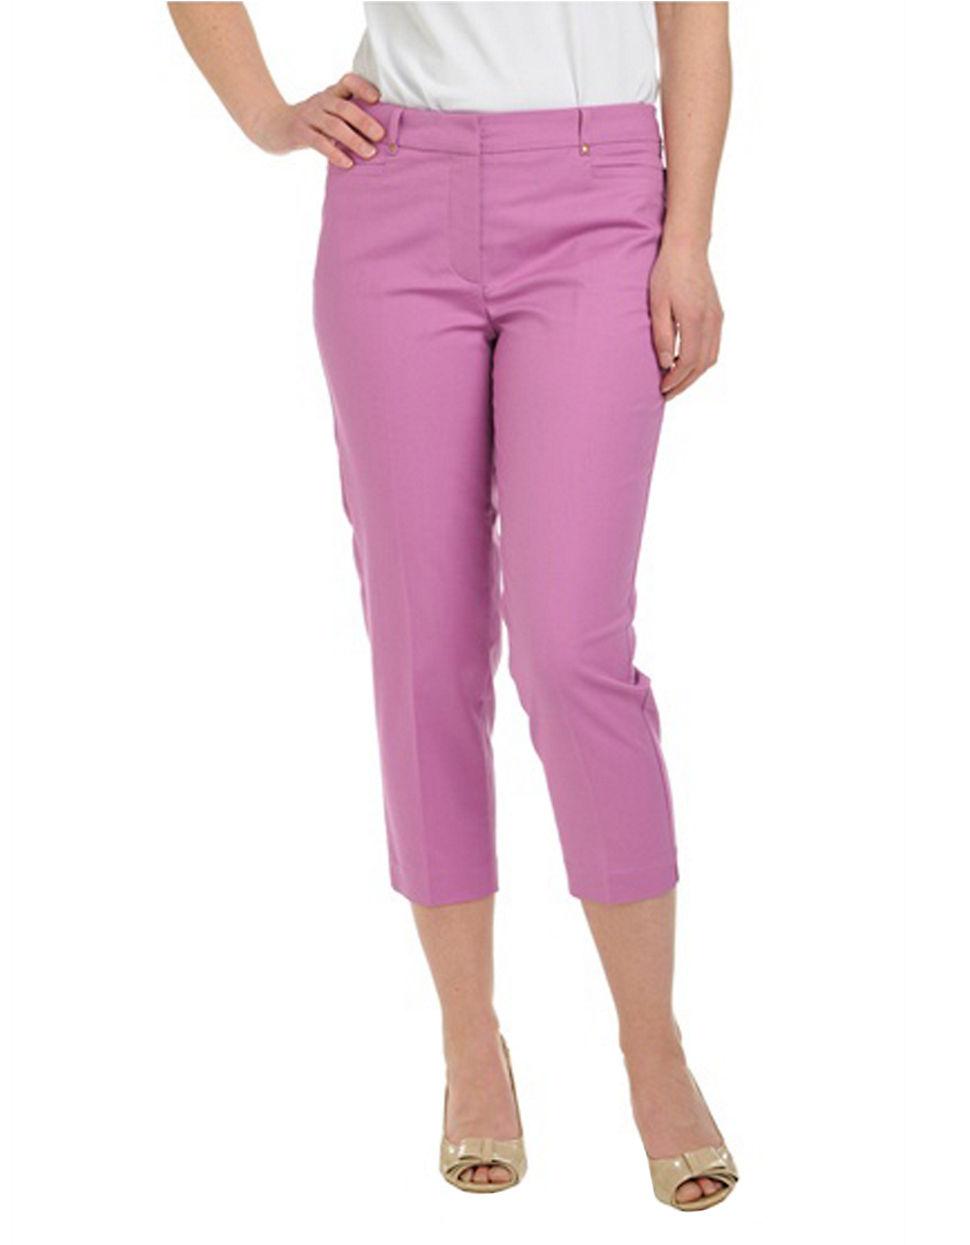 Plus Size Comfort Waist Straight Leg Wide Waistband L Pocket Capri purple 22 W